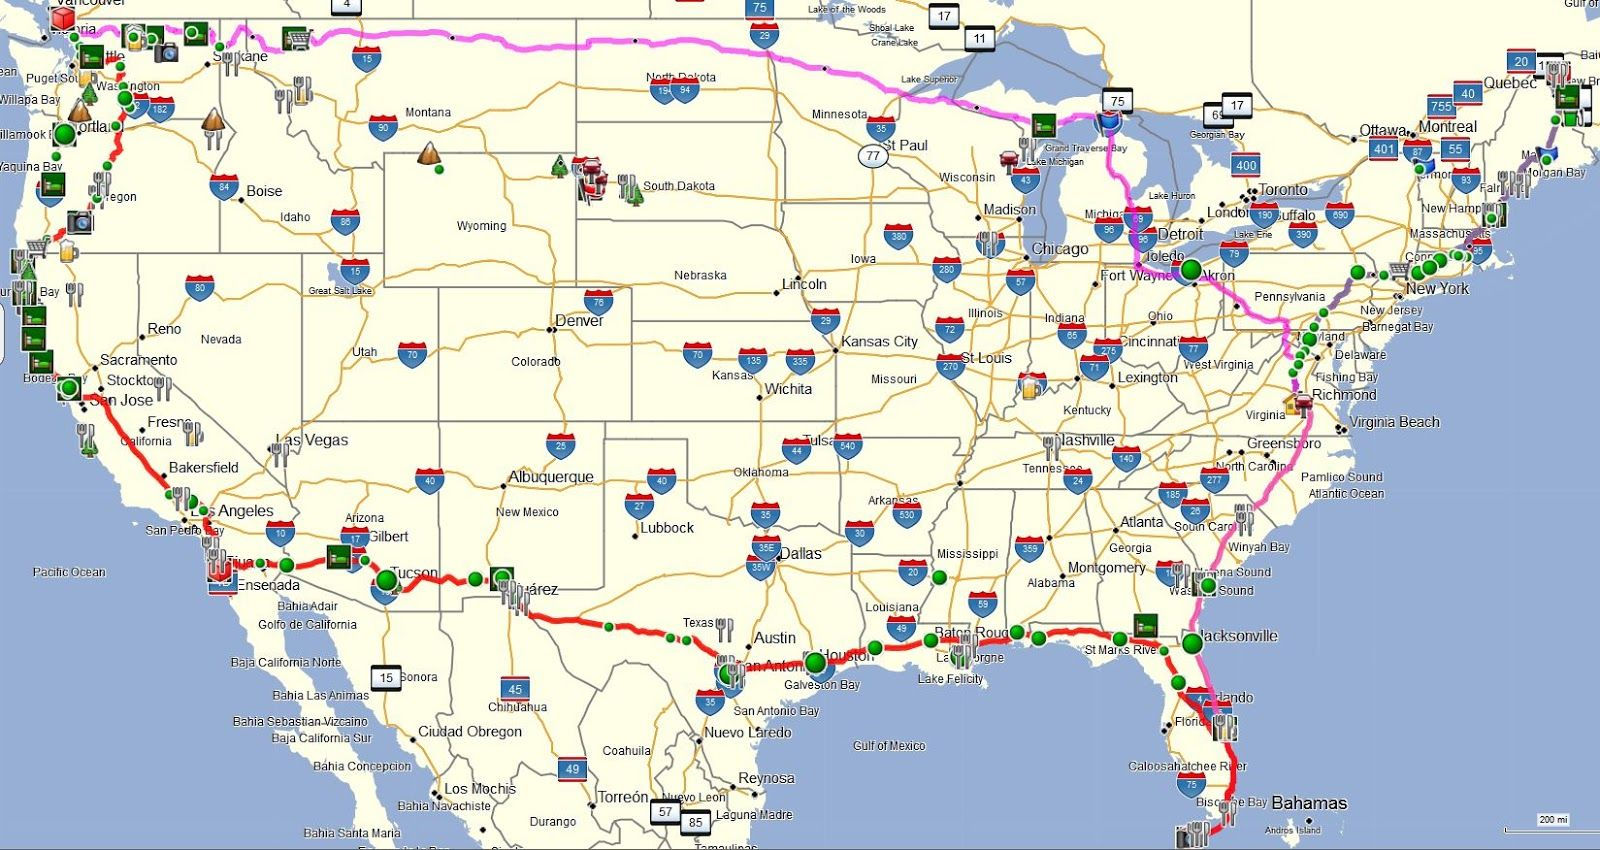 Httpssmediacacheakpinimgcomoriginals - Us map with roads